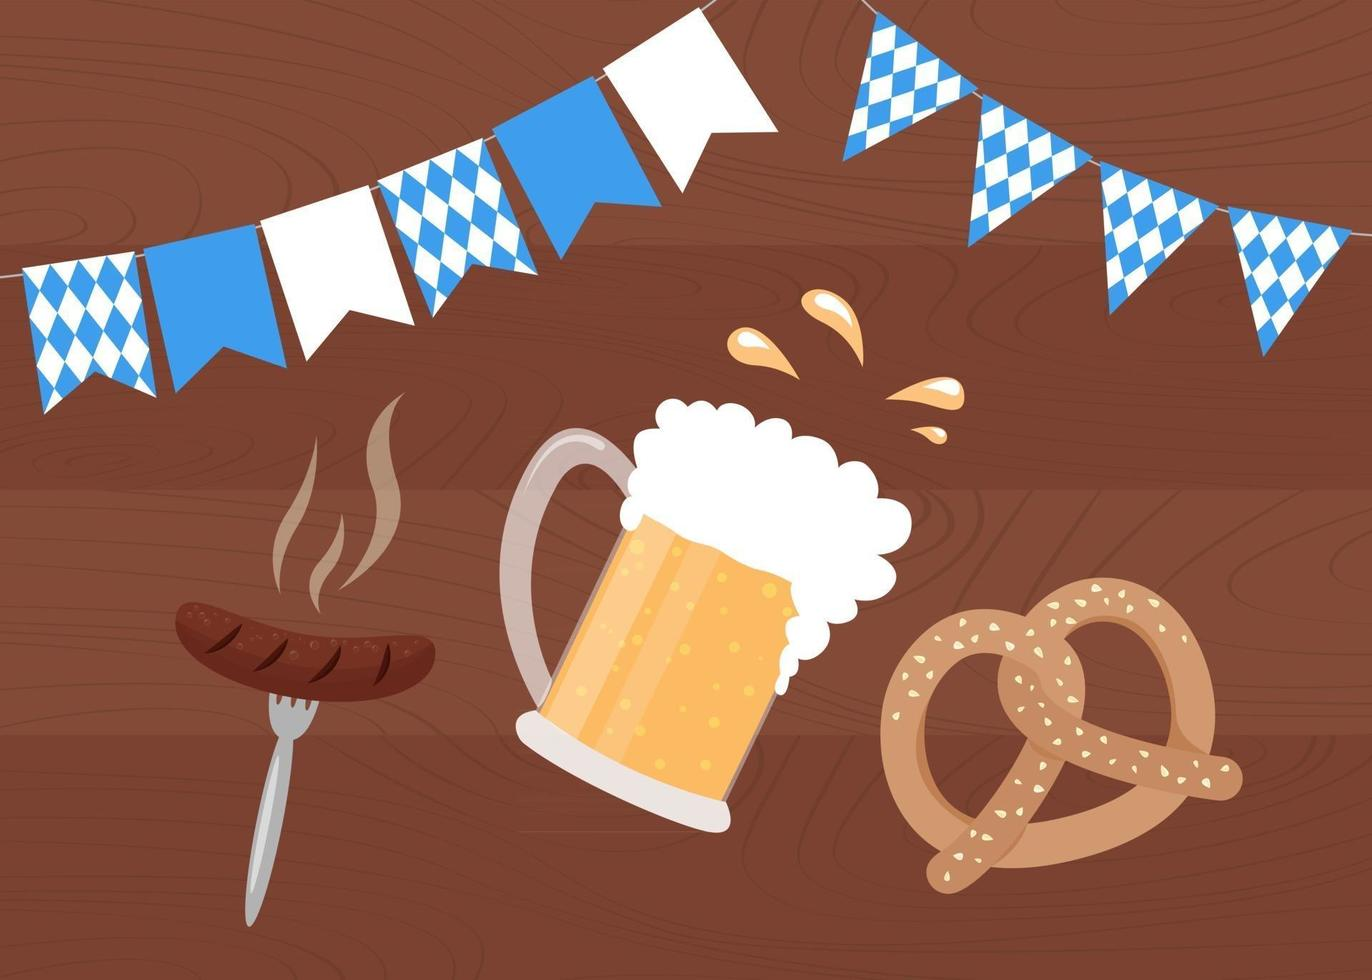 Oktoberfest food on wooden background. Beer mug, pretzel and bavarian sausage. Oktoberfest poster with traditional flags. Vector illustration